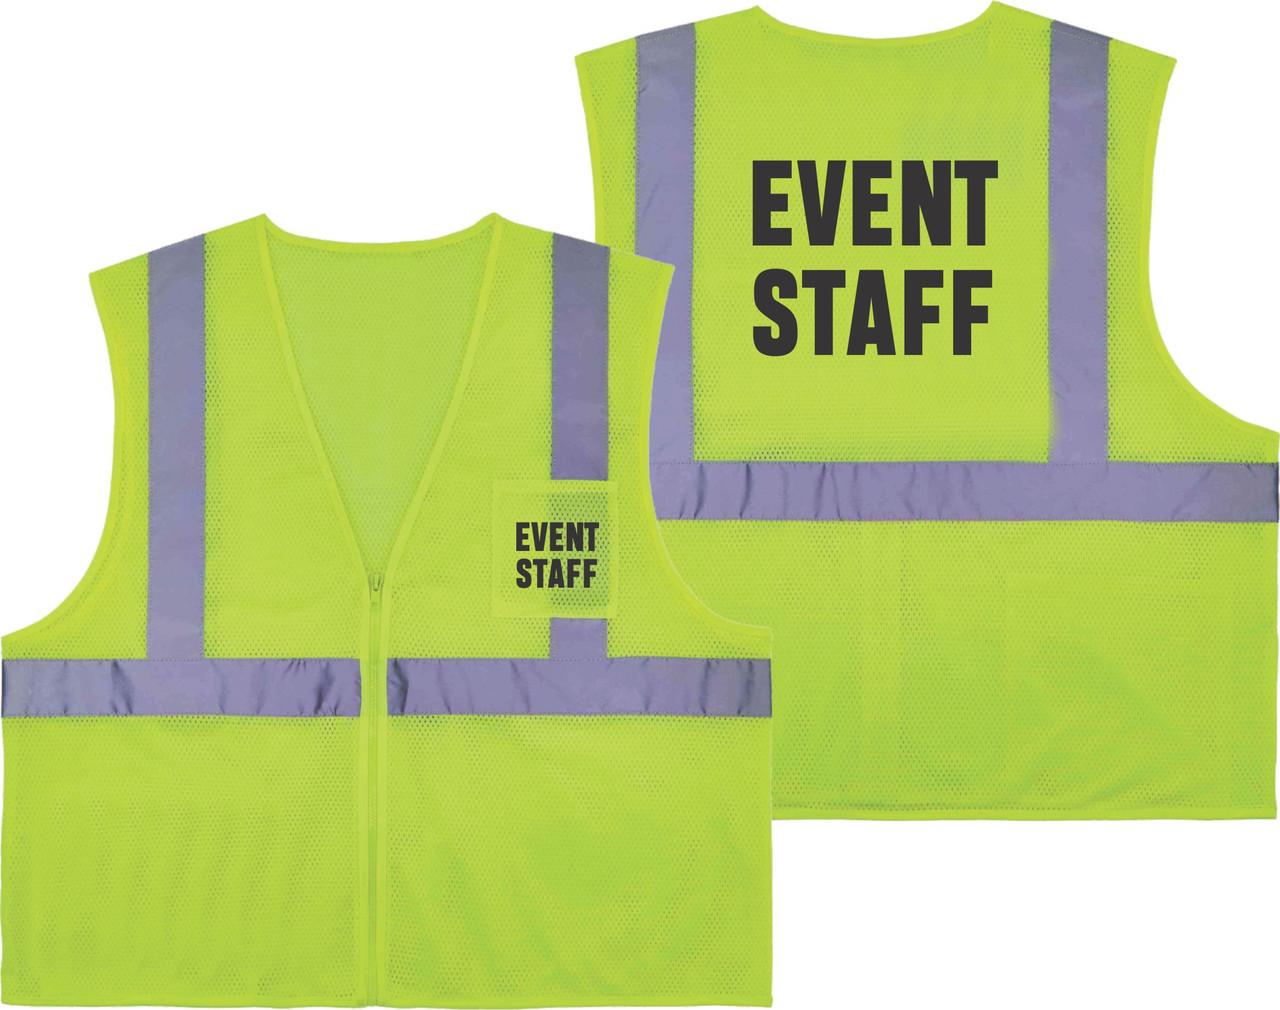 Printed EVENT STAFF Safety Vest Class 2 - Great for Hi Vis Vest for Events